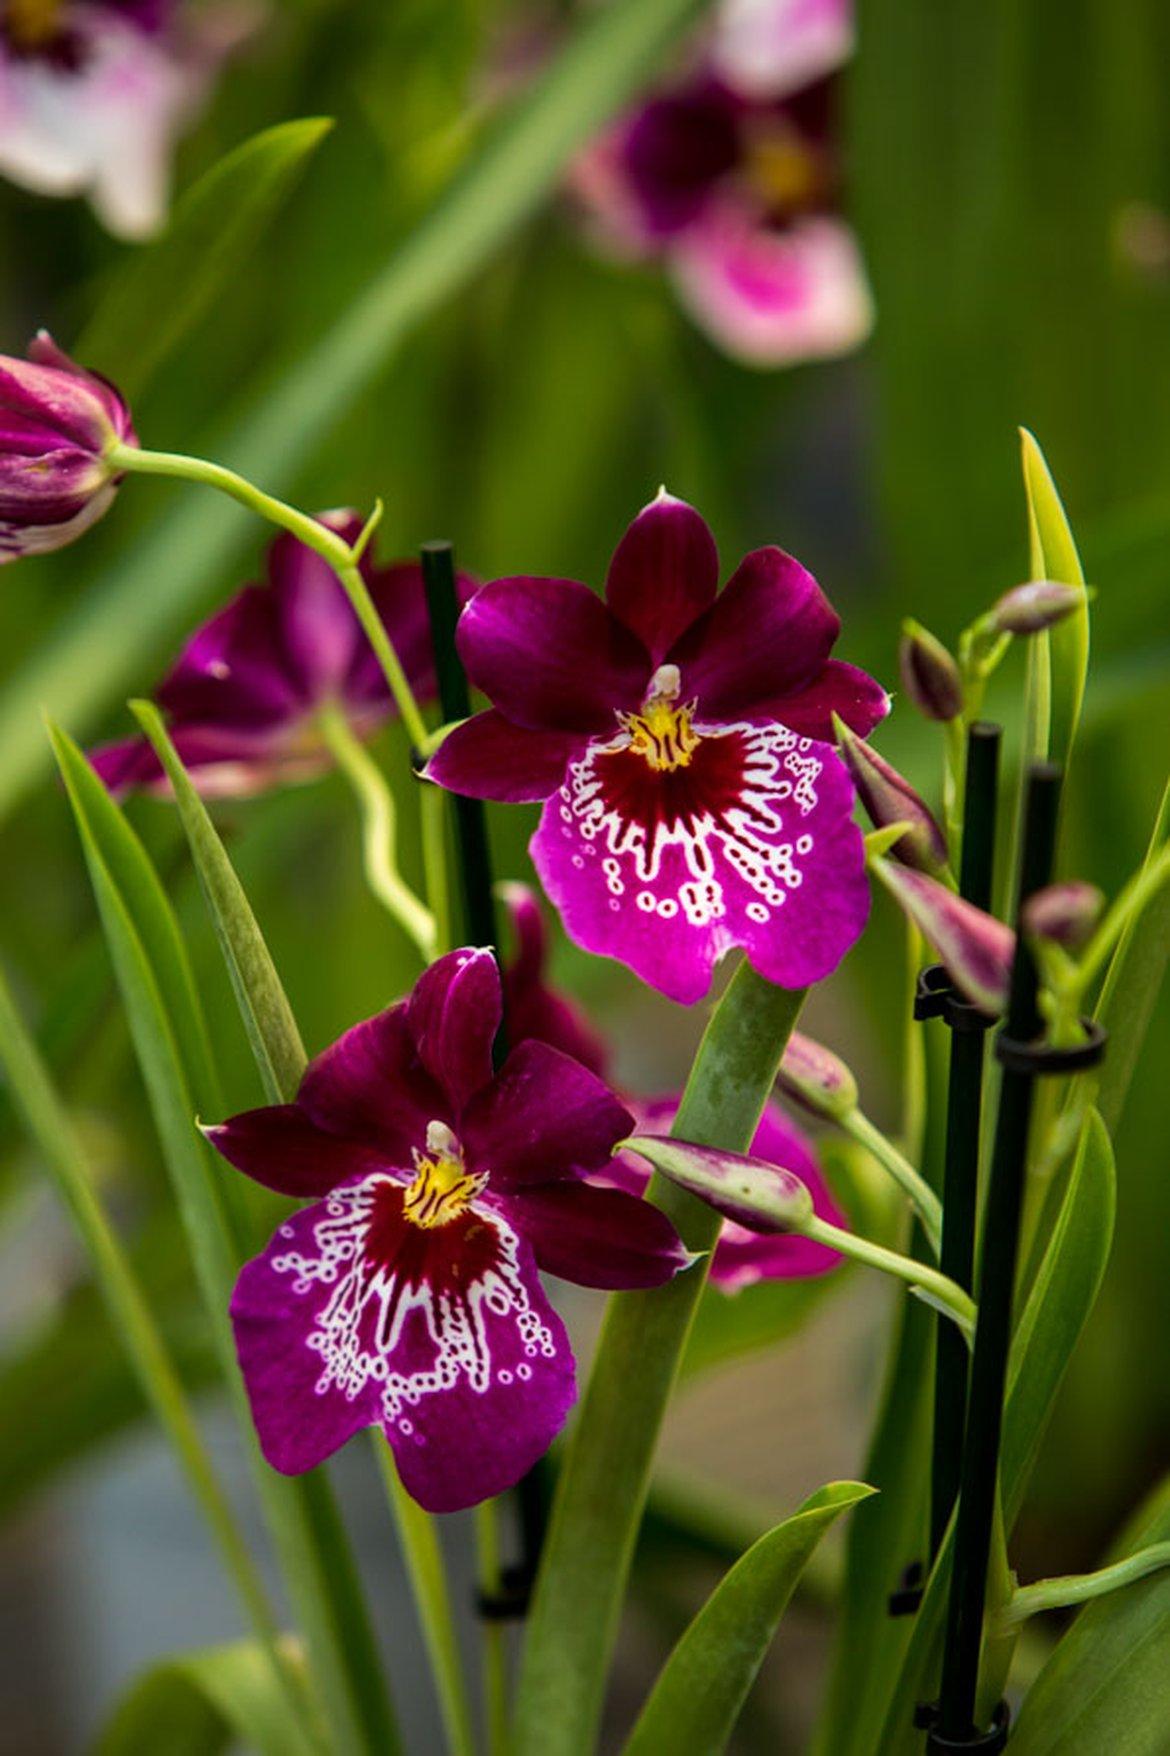 conseils et soins des orchid es schilliger. Black Bedroom Furniture Sets. Home Design Ideas